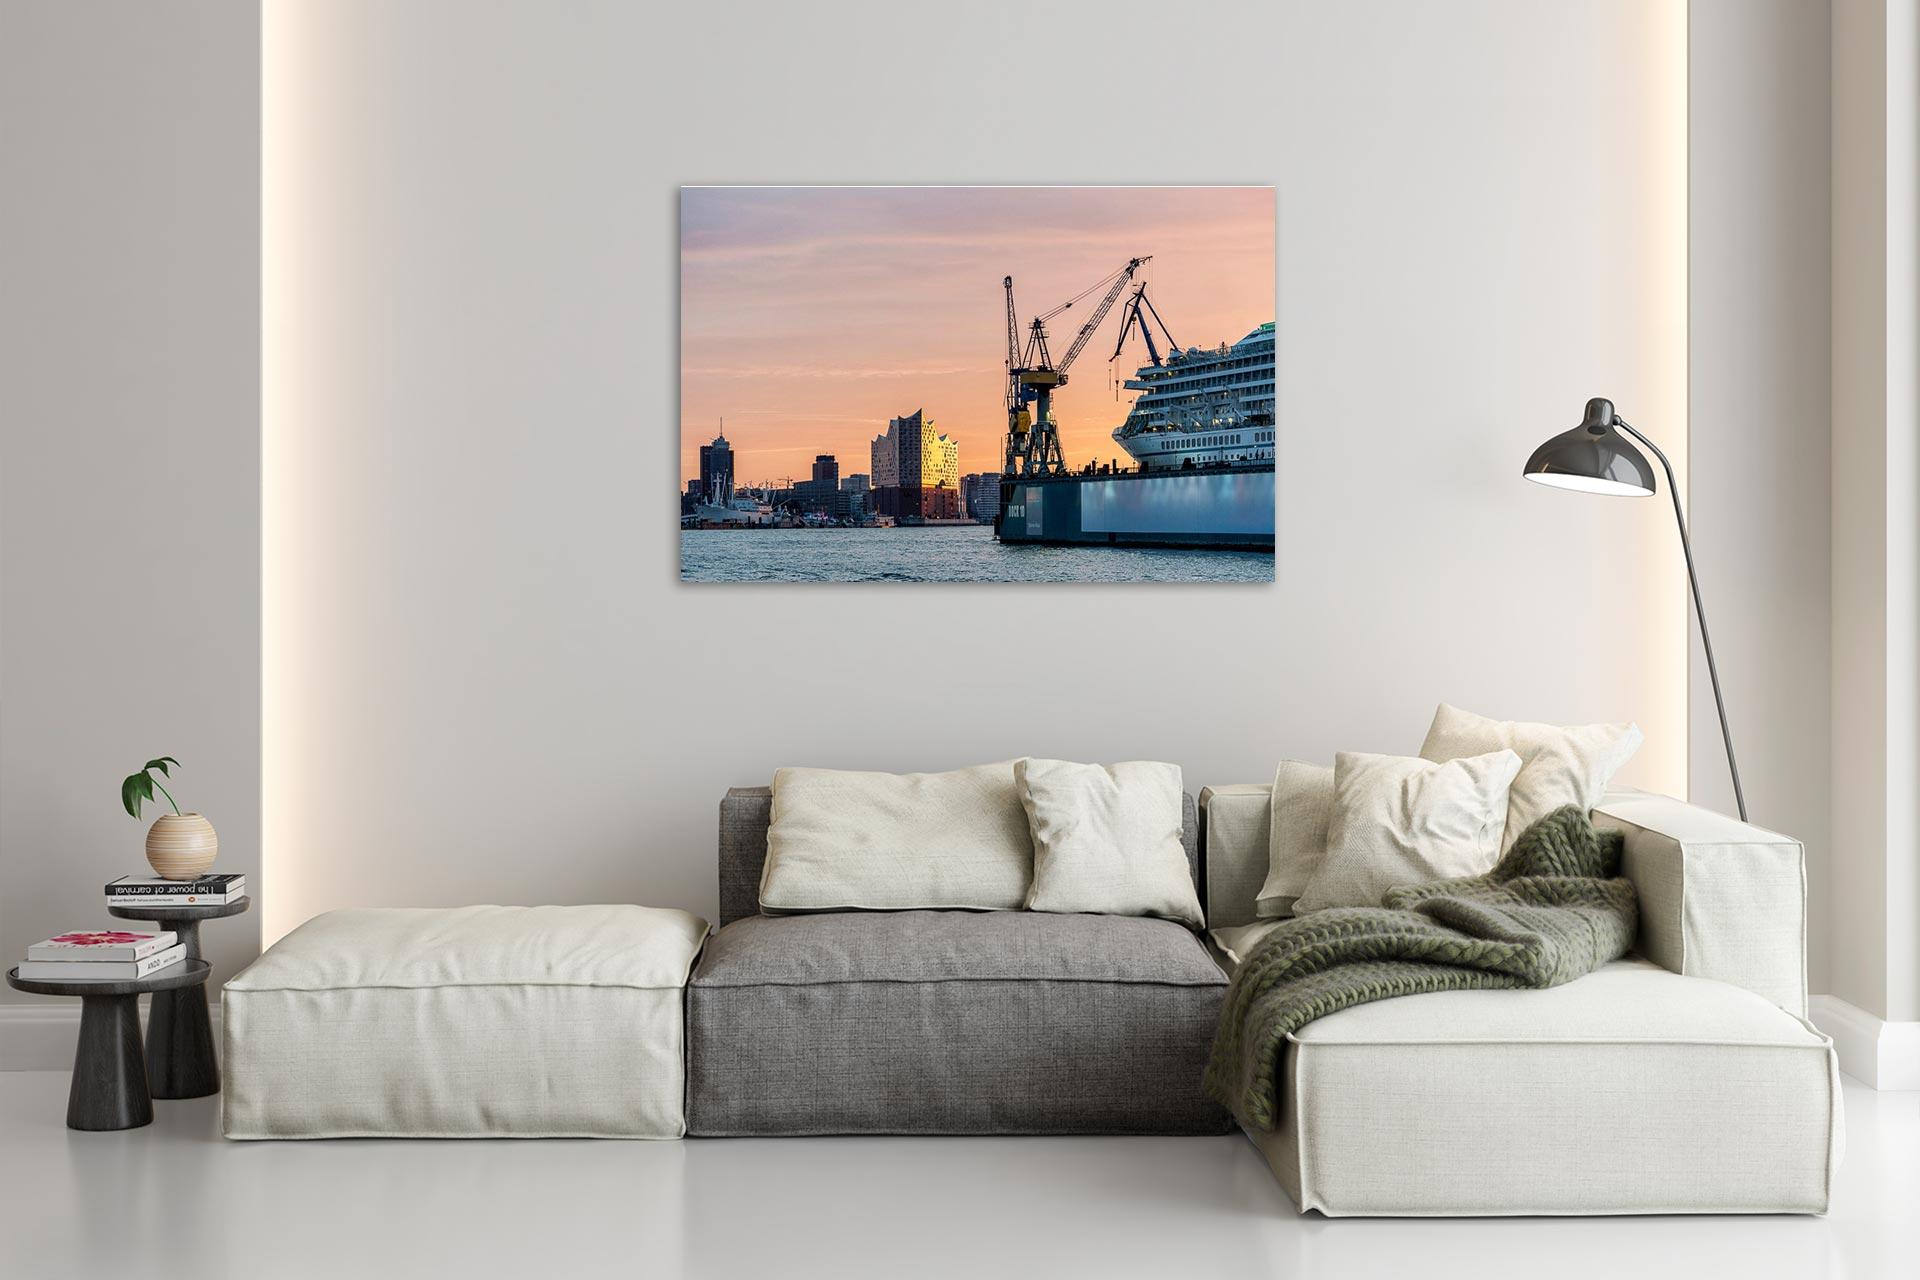 LCW256-dock-11i-hamburg-wandbild-bild-auf-leinwand-acrylglas-aludibond-wohnzimmer